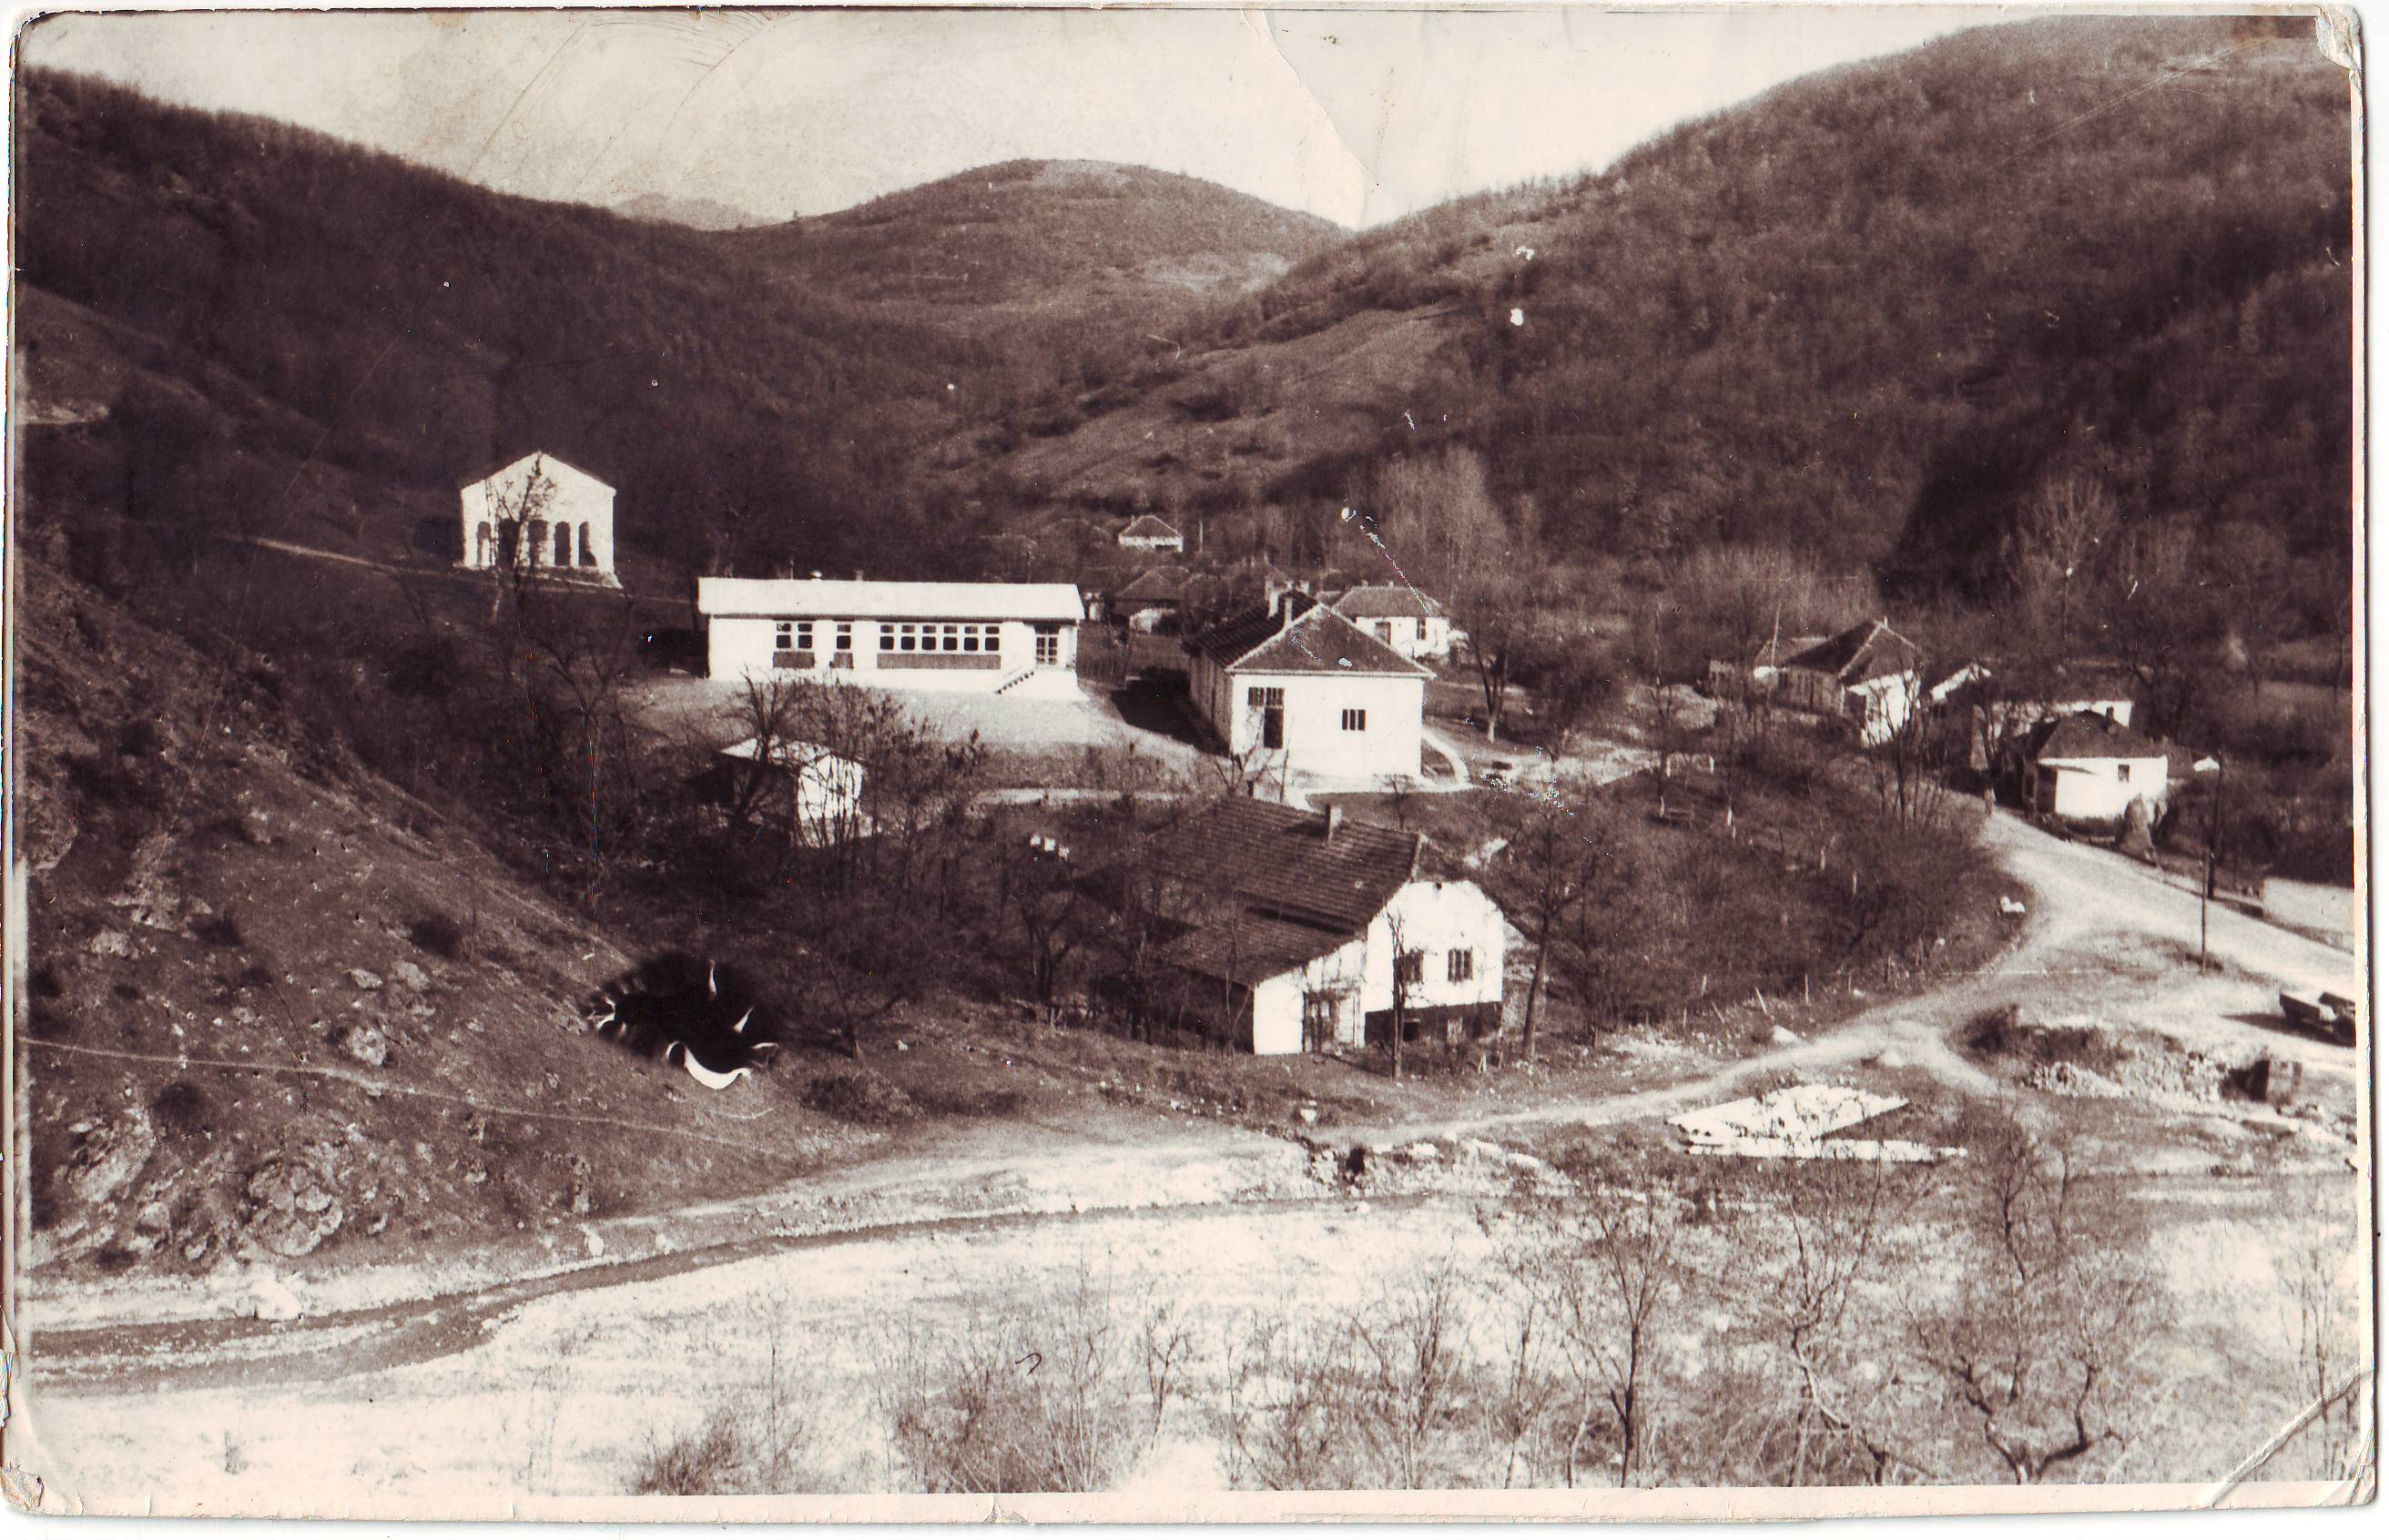 Foto zapis 1975, selo Kruševica (crkva, škola i deo sela). Snimio: Miroslav Mladenović, nastavnik škole u Kruševici